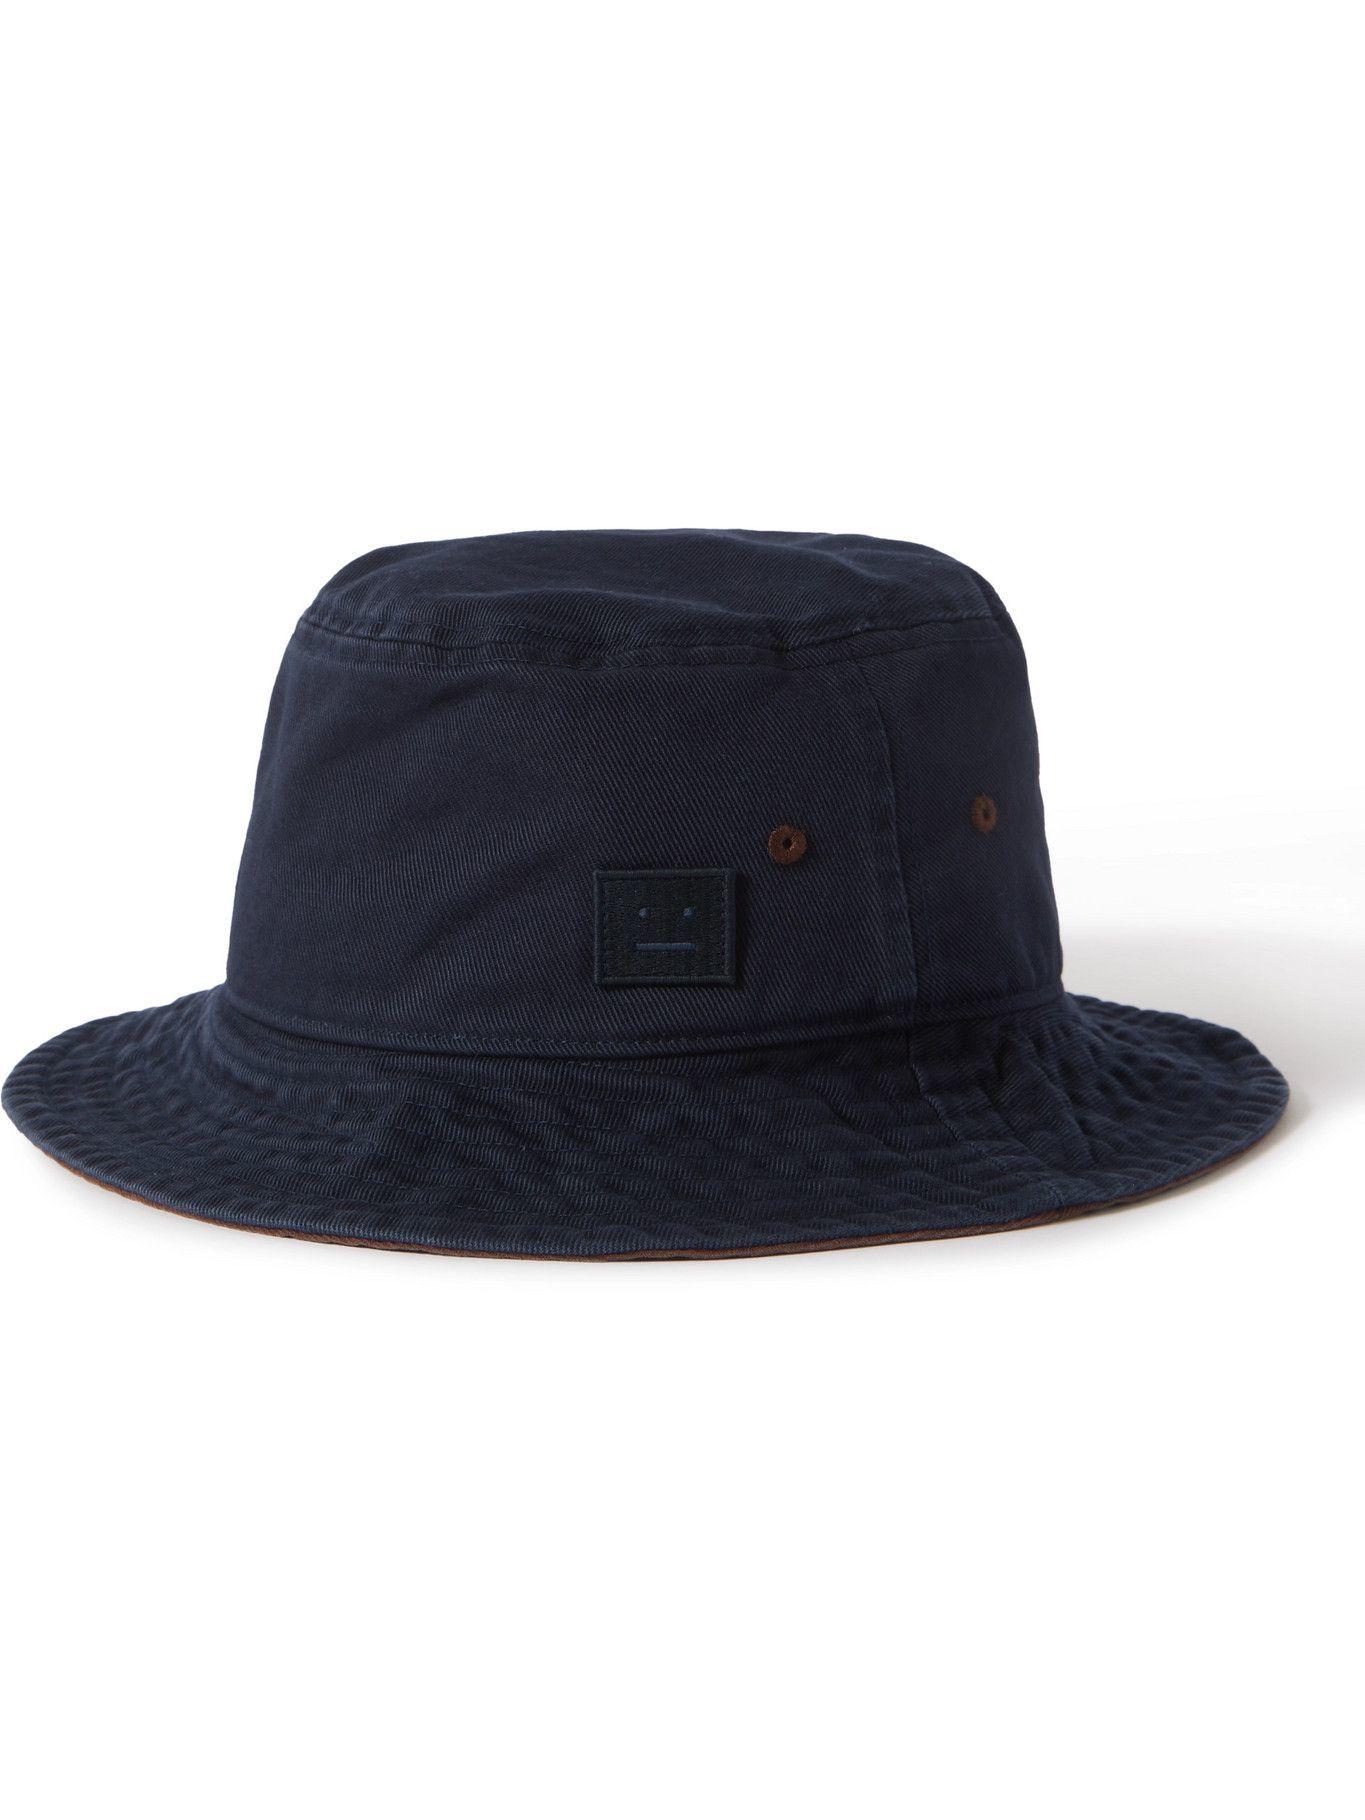 ACNE STUDIOS - Logo-Appliquéd Cotton-Twill Bucket Hat